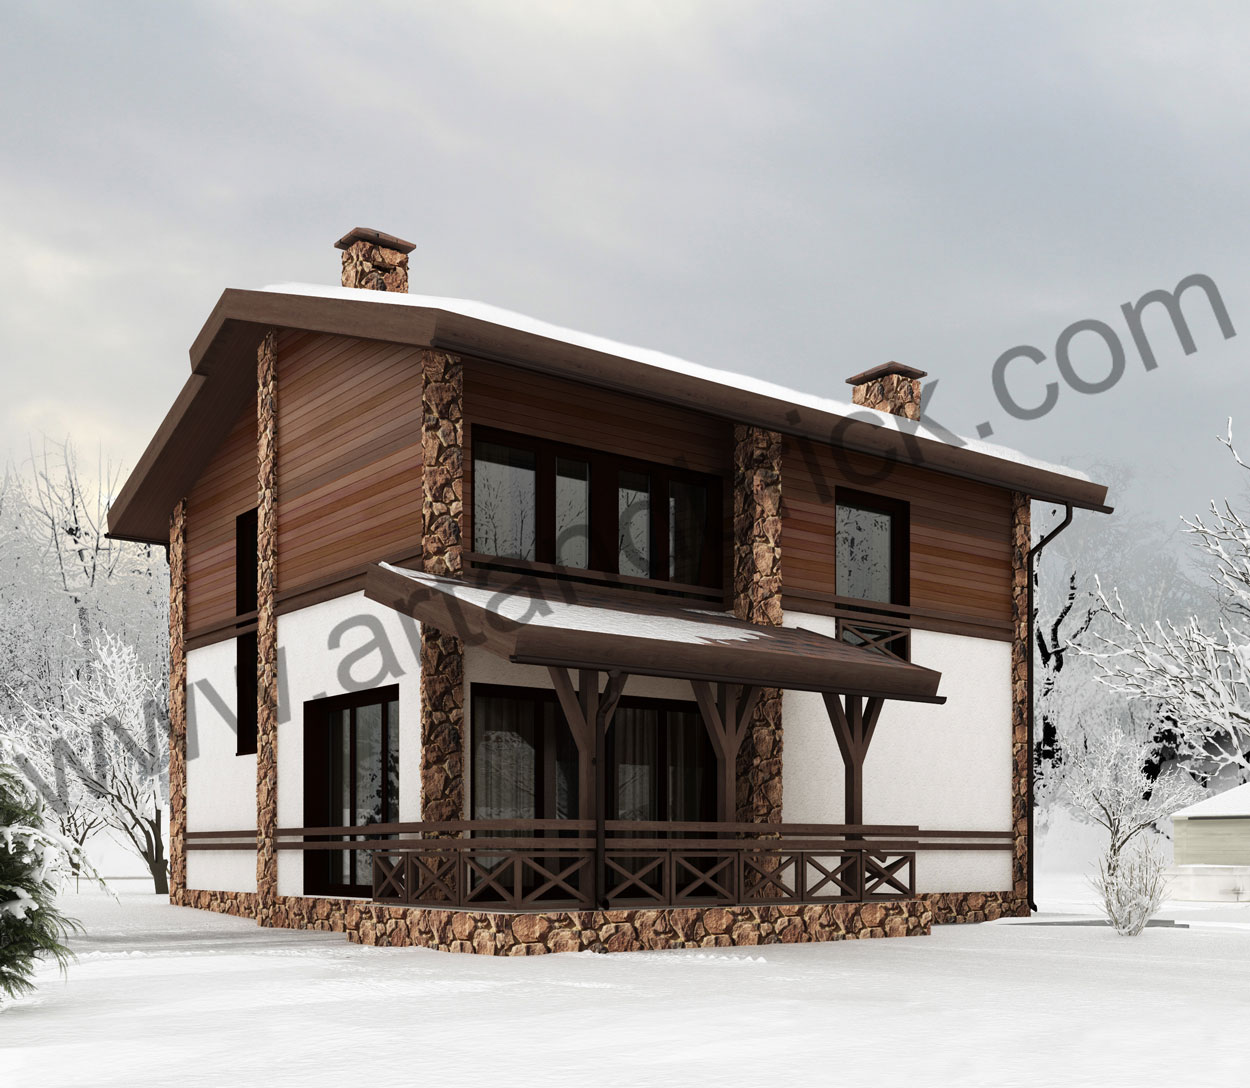 Проект дома в стиле Шале – задний фасад. Площадь проекта частного дома – 150 кв.м.